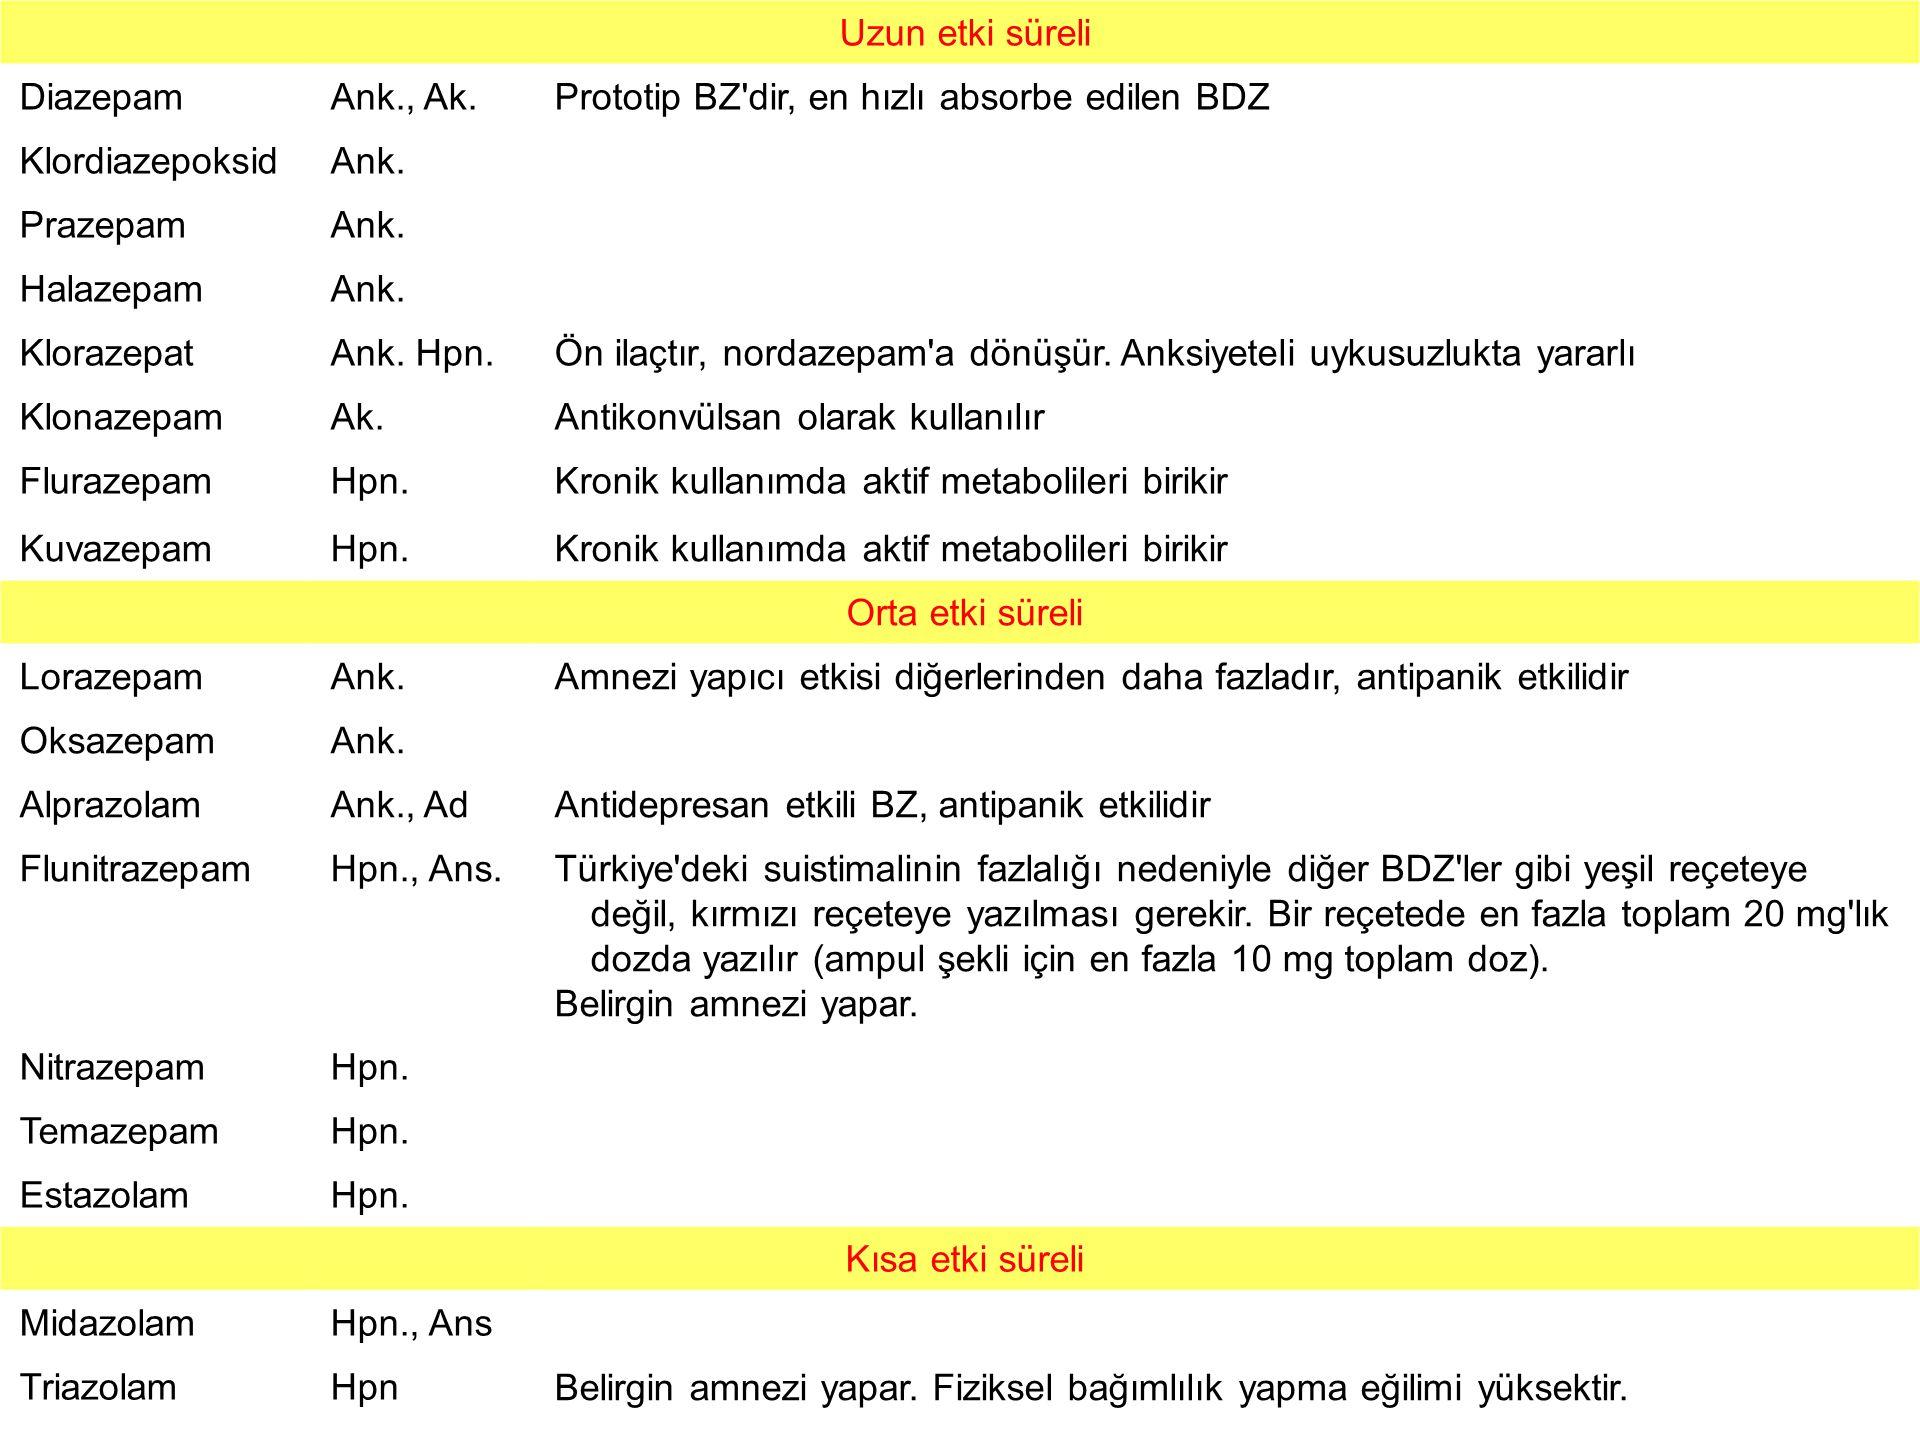 Antipsikotikler (Nöroleptikler)